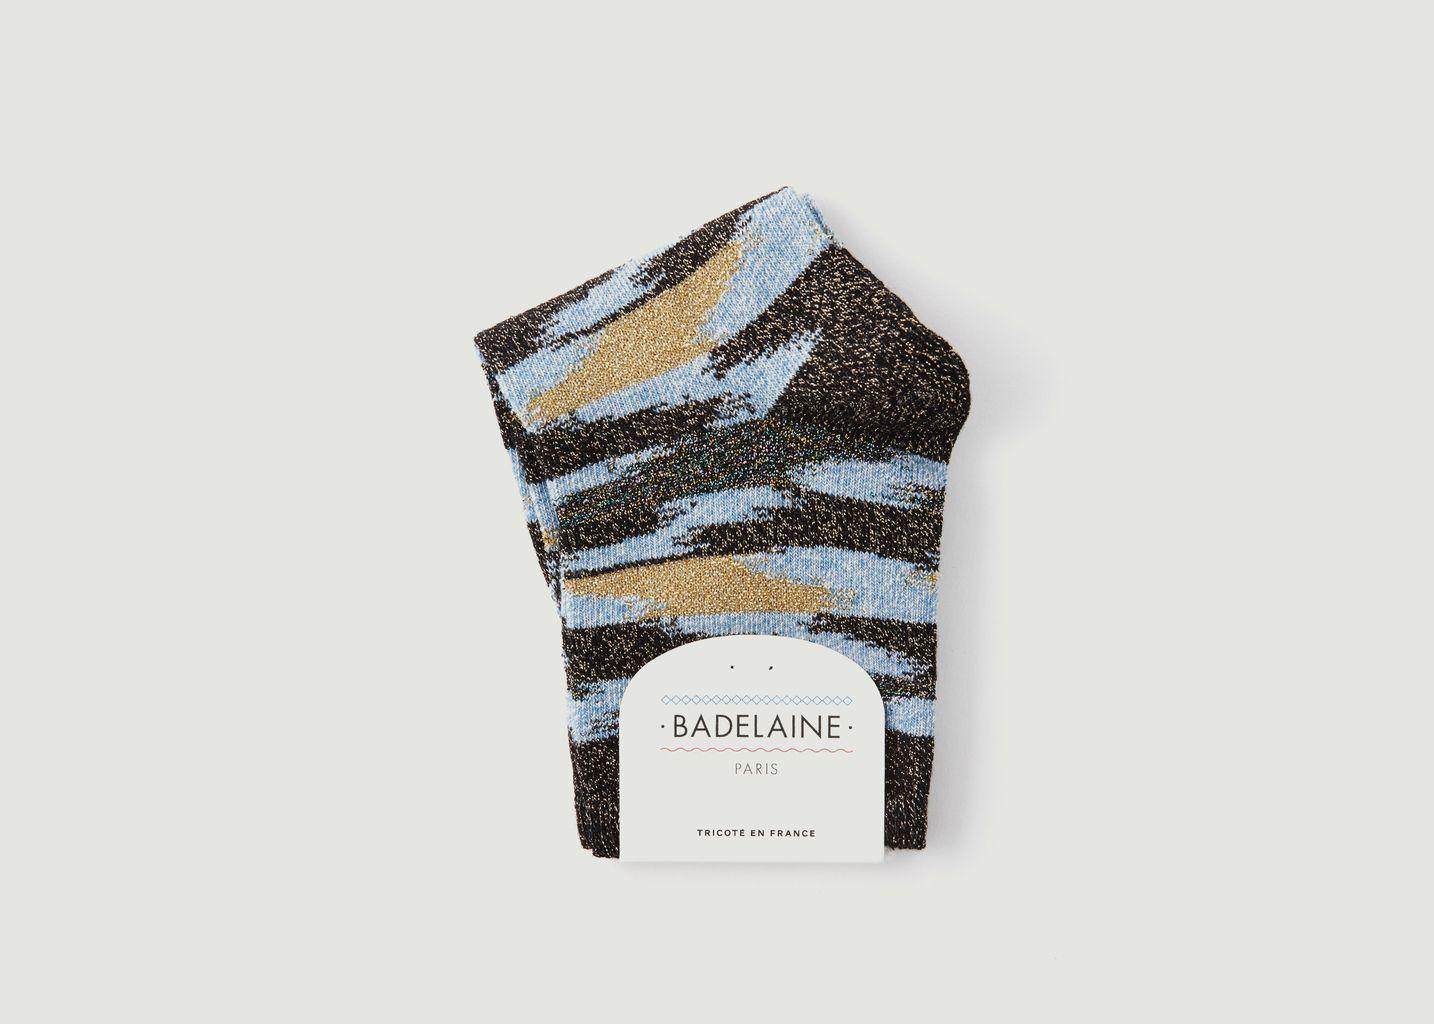 Chaussettes Avec Lurex Ikat Wave - Badelaine